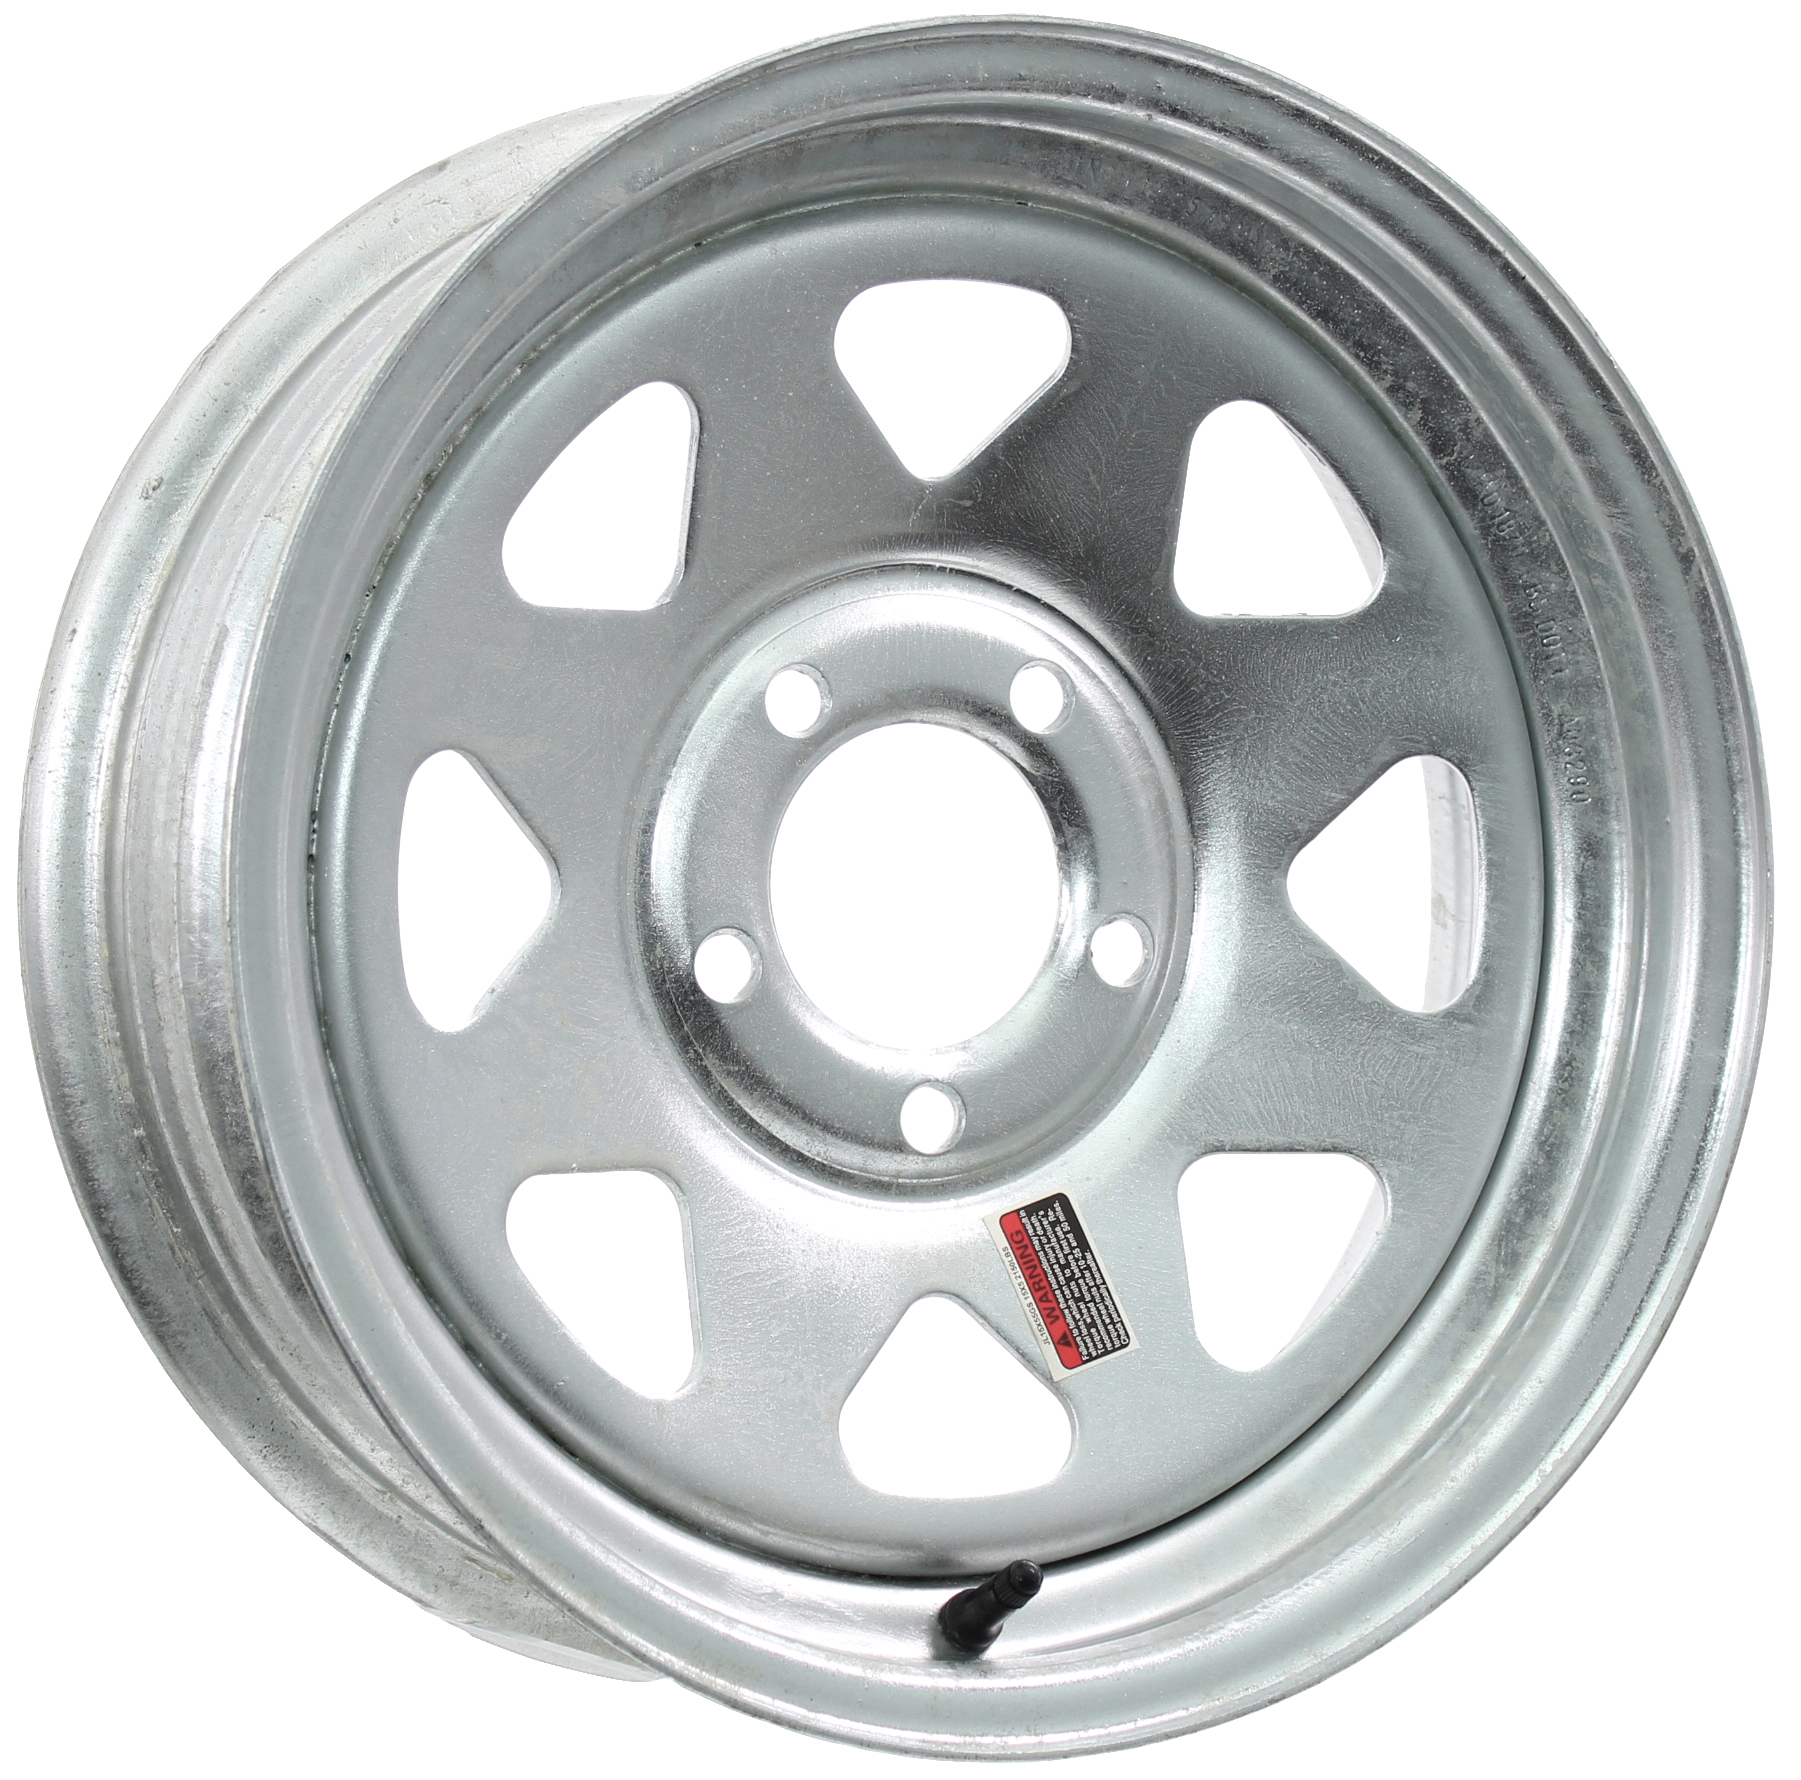 15x6 5-Lug Galvanized Spoke Steel Trailer Wheel Image